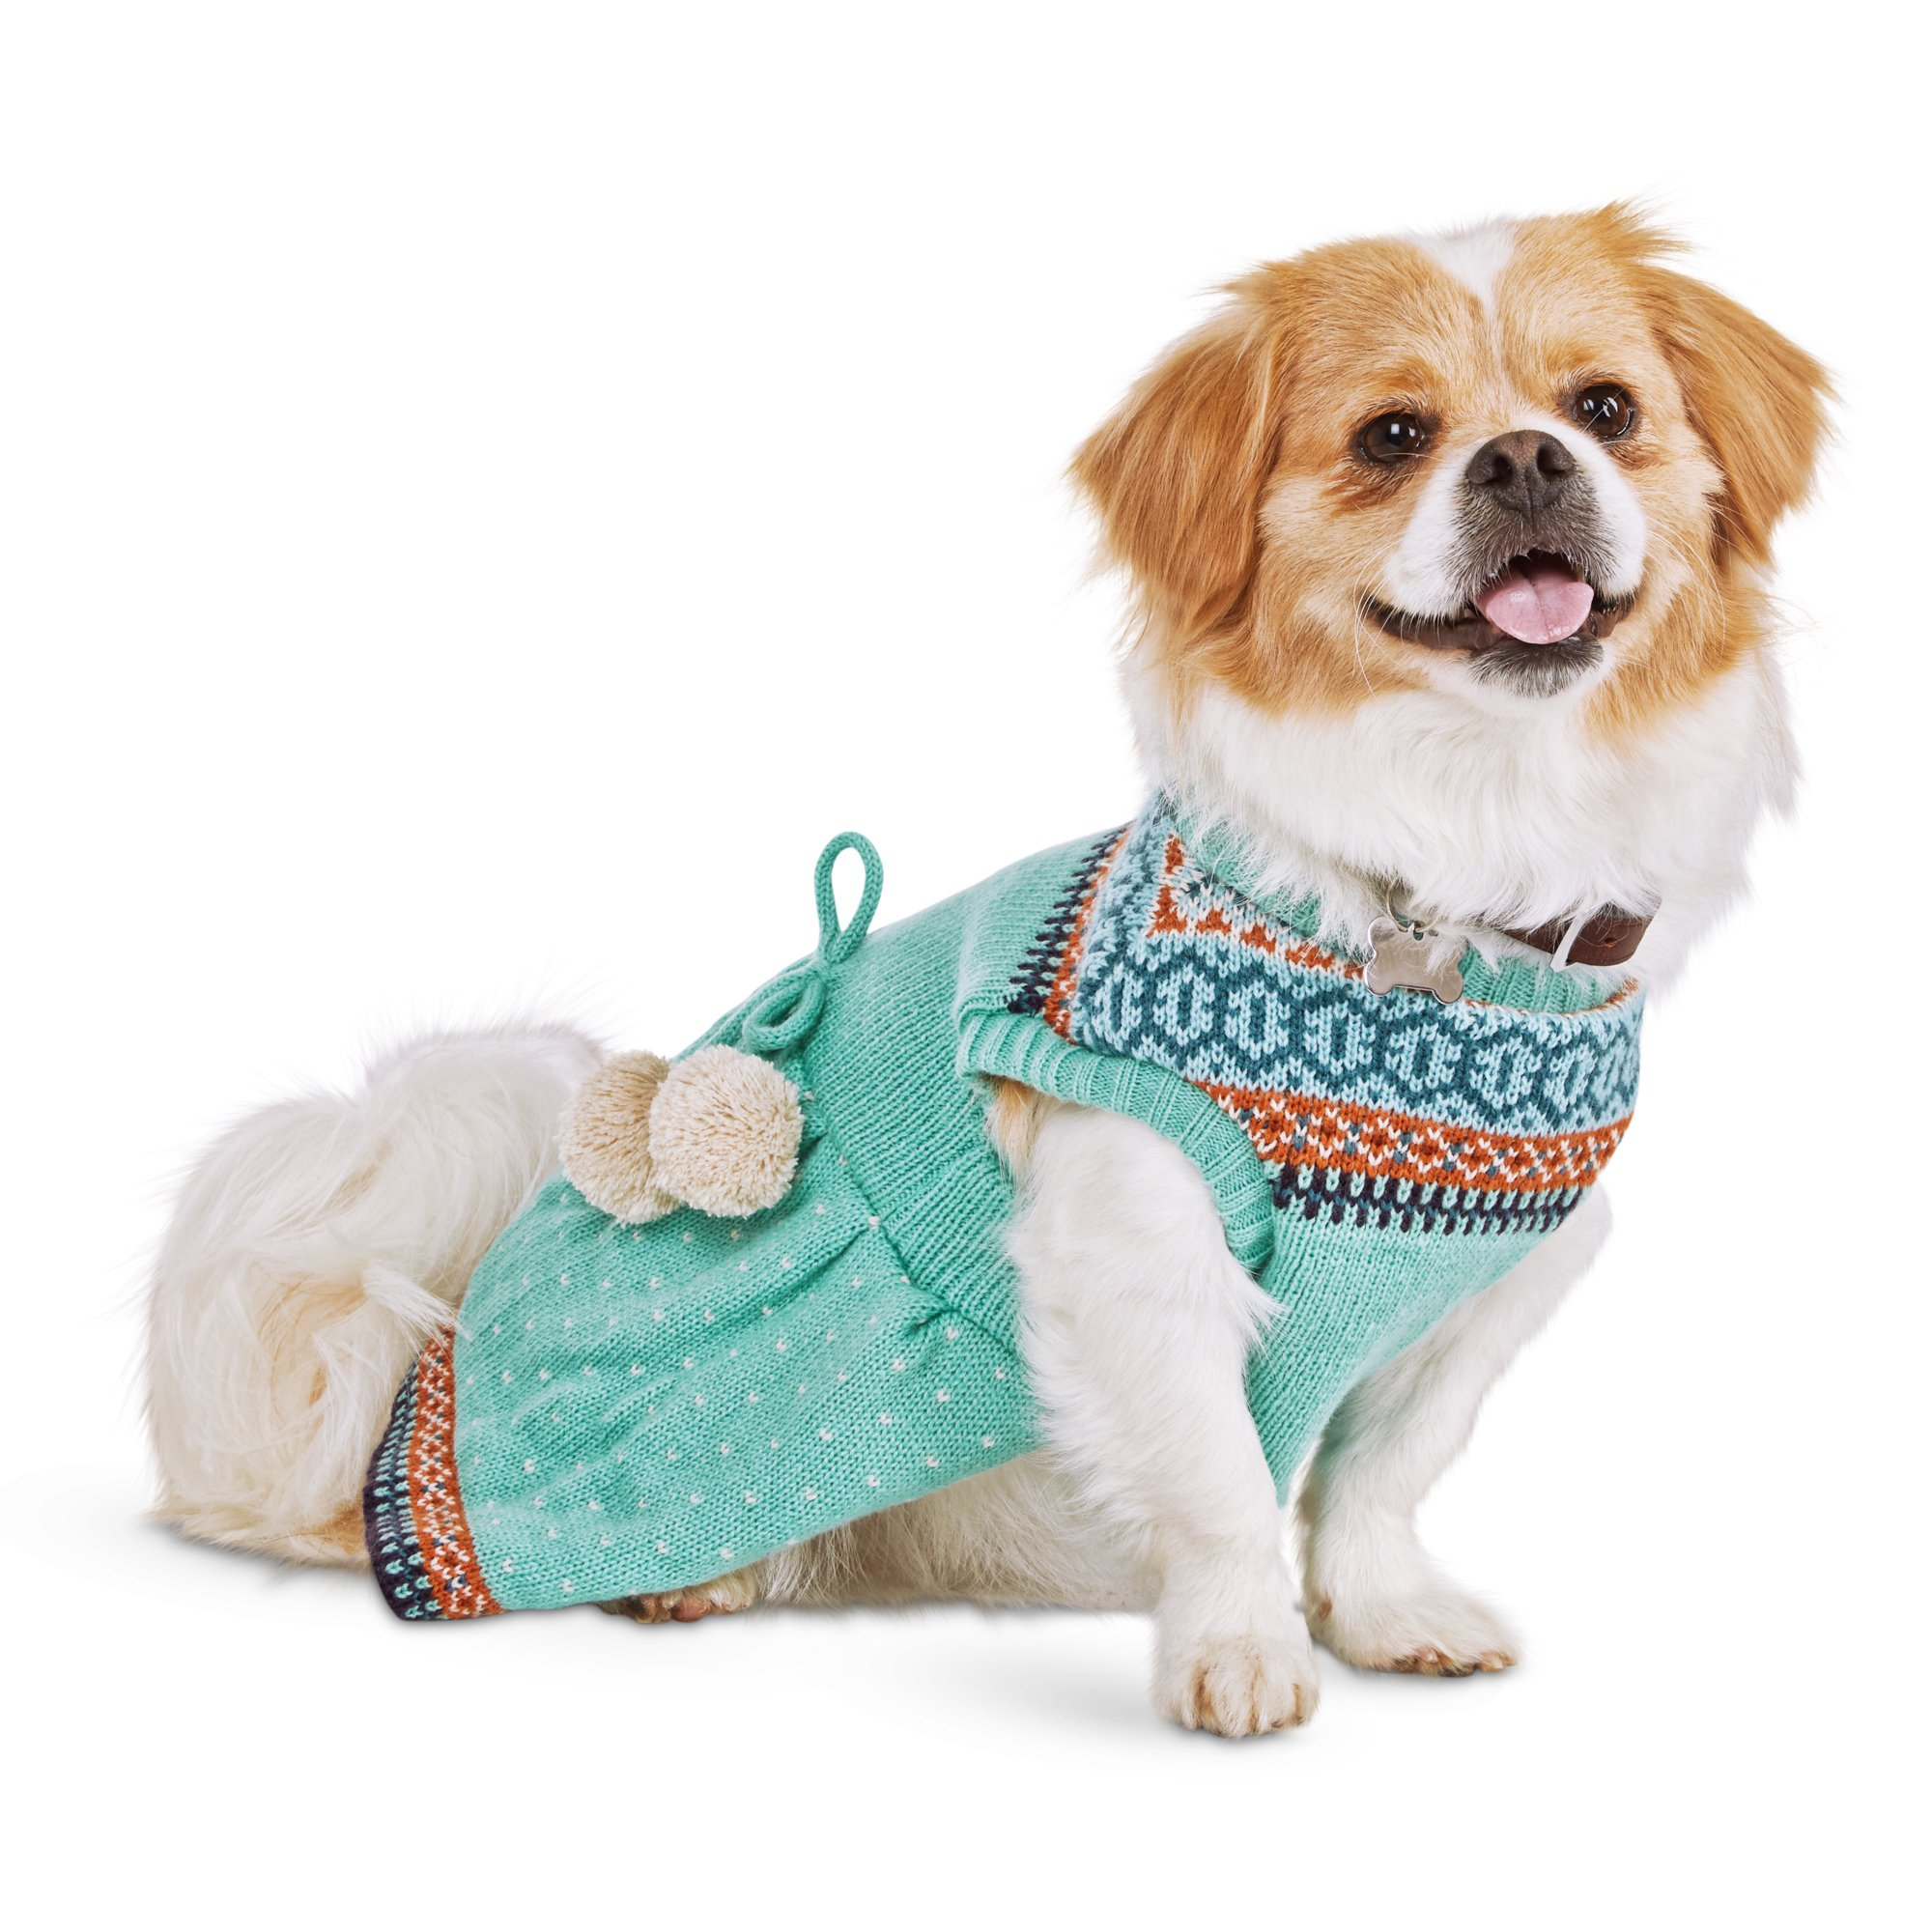 Bond Co Pom Pom Fair Isle Dog Dress Petco Dog Dresses Petco Fair Isle